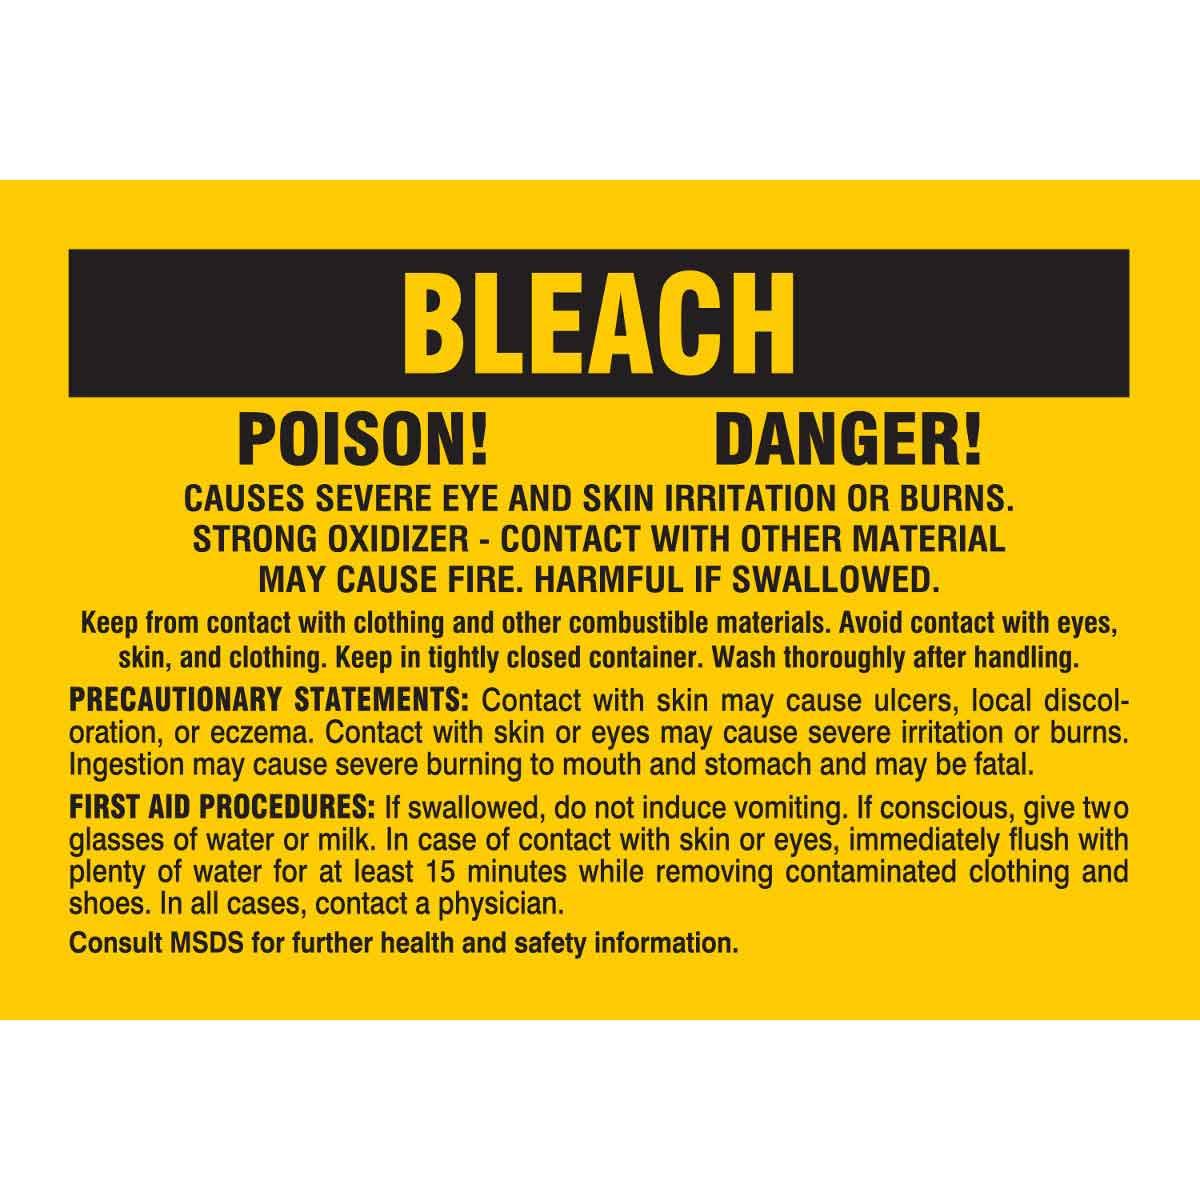 Bleach Poison Danger Causes Severe Eye and Skin Irritation Or Burns Labels